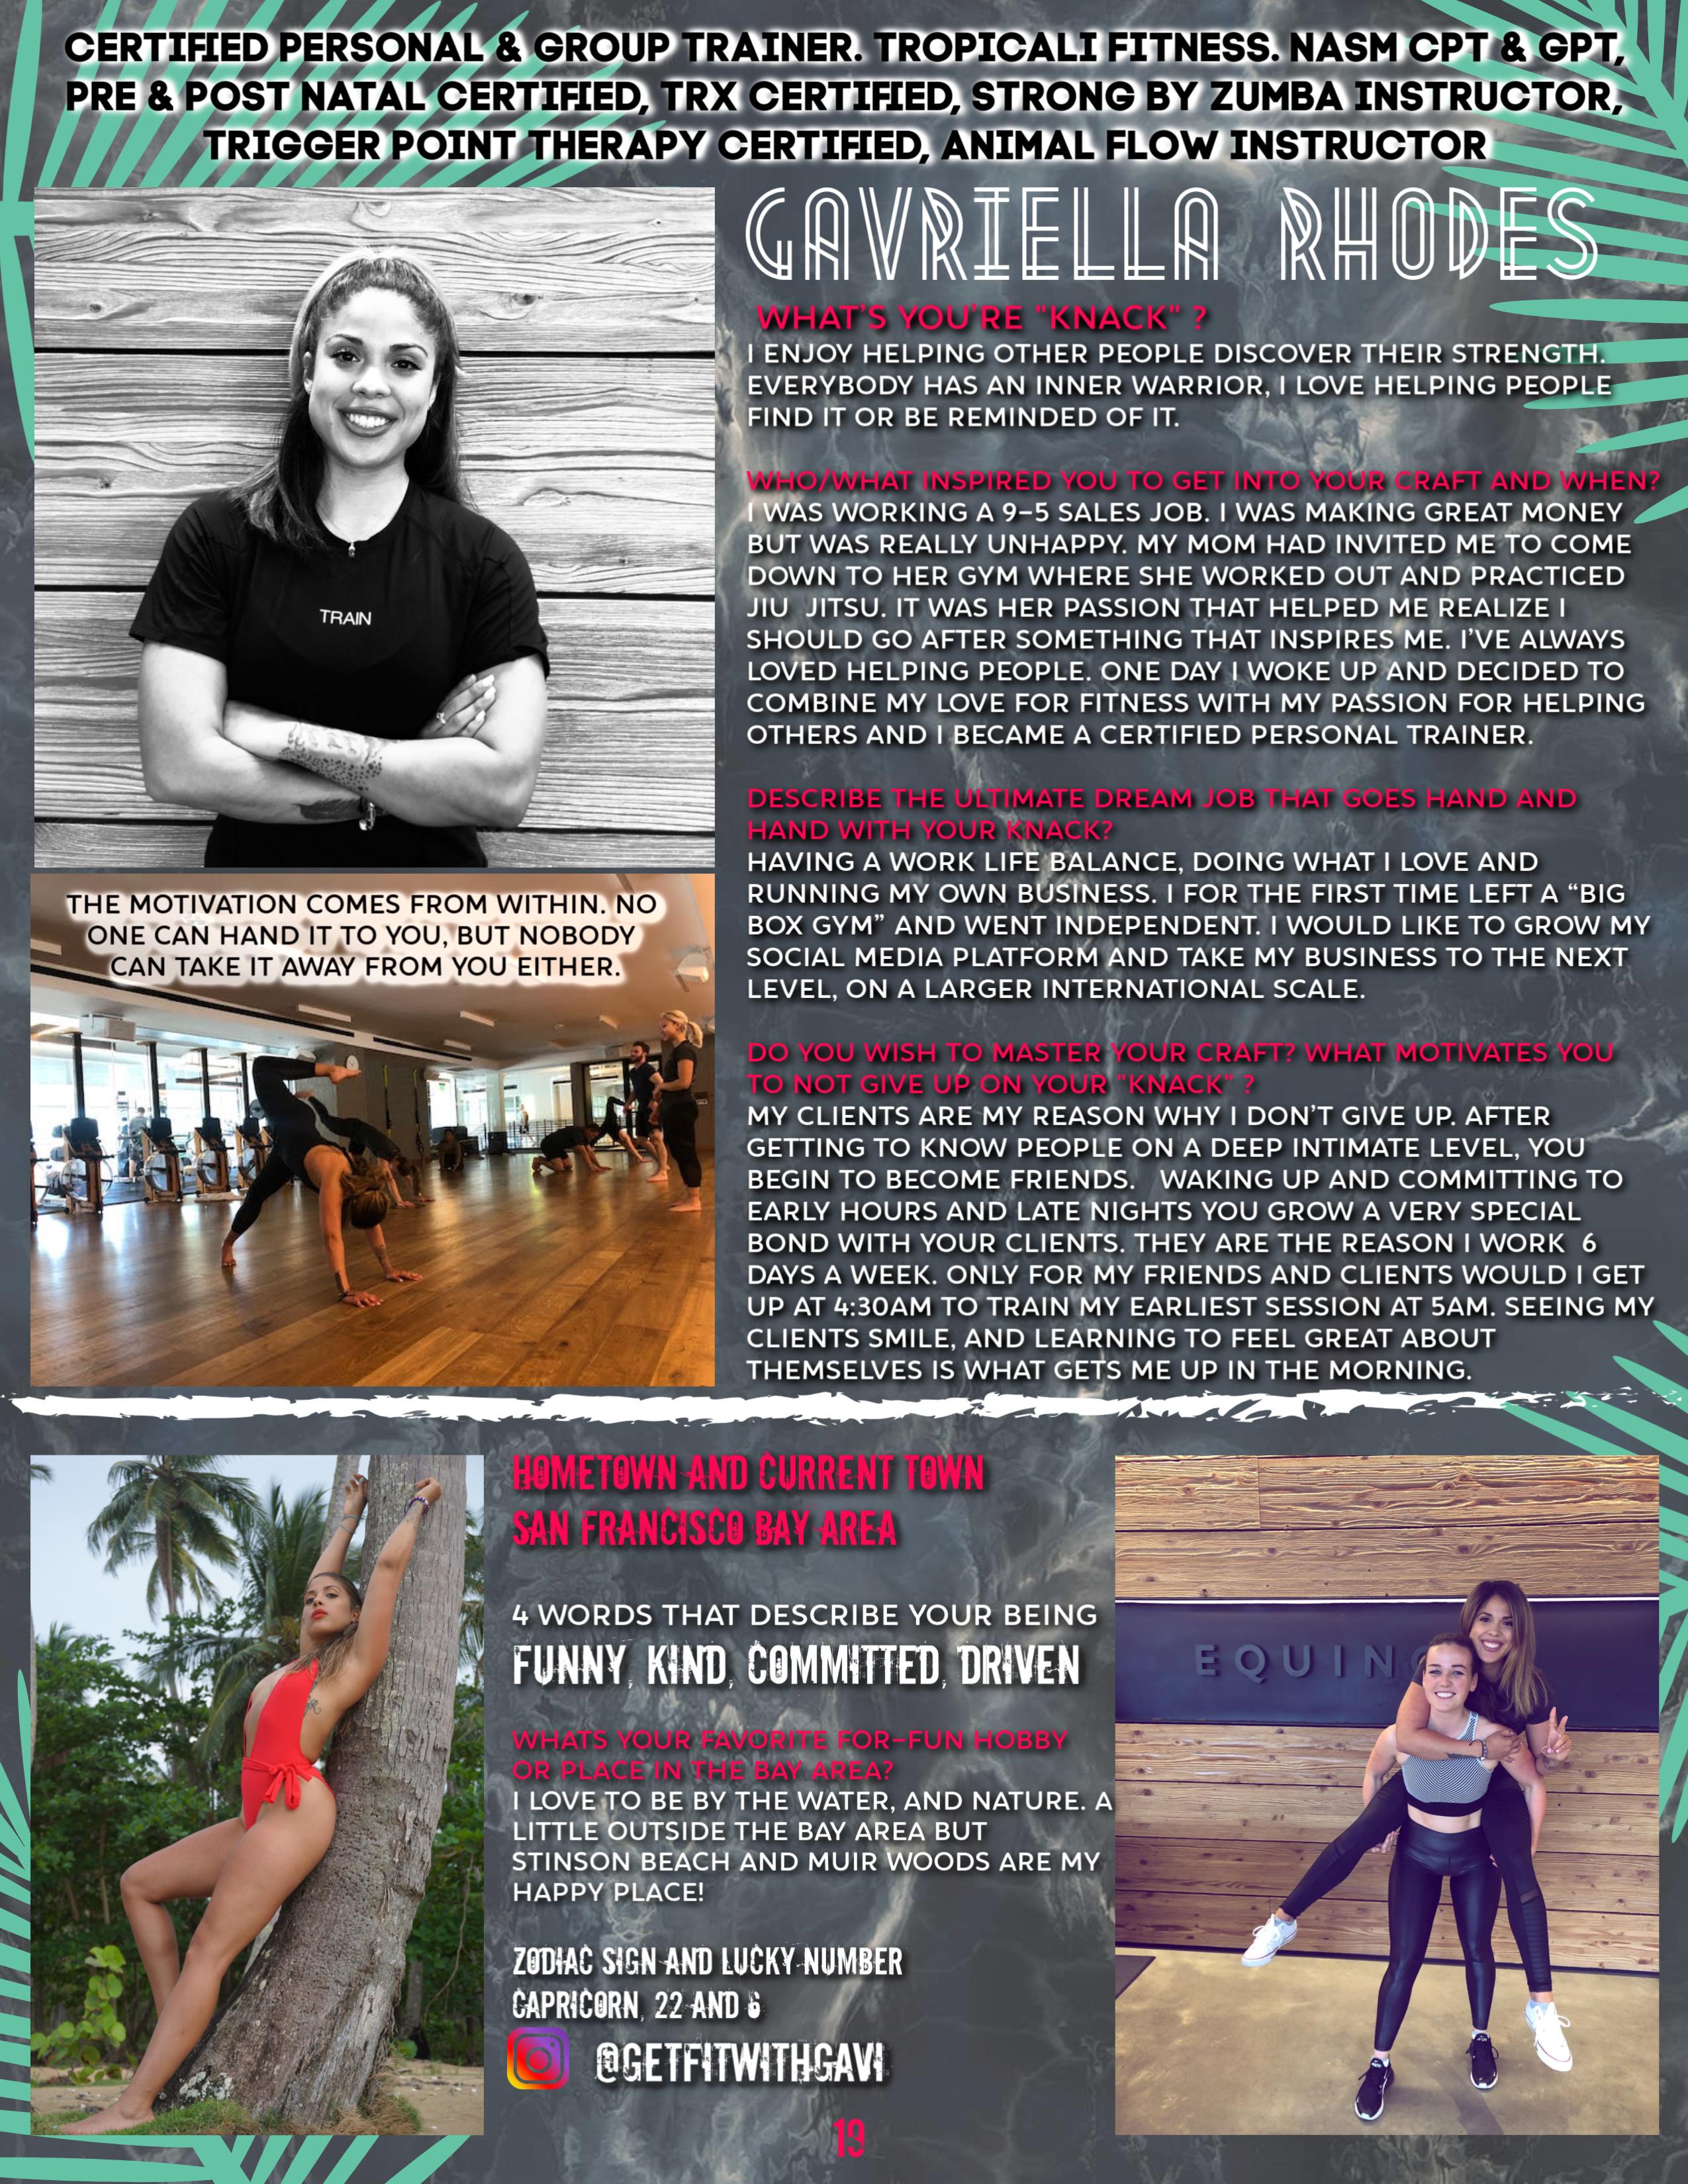 19 Tropicali Fitness